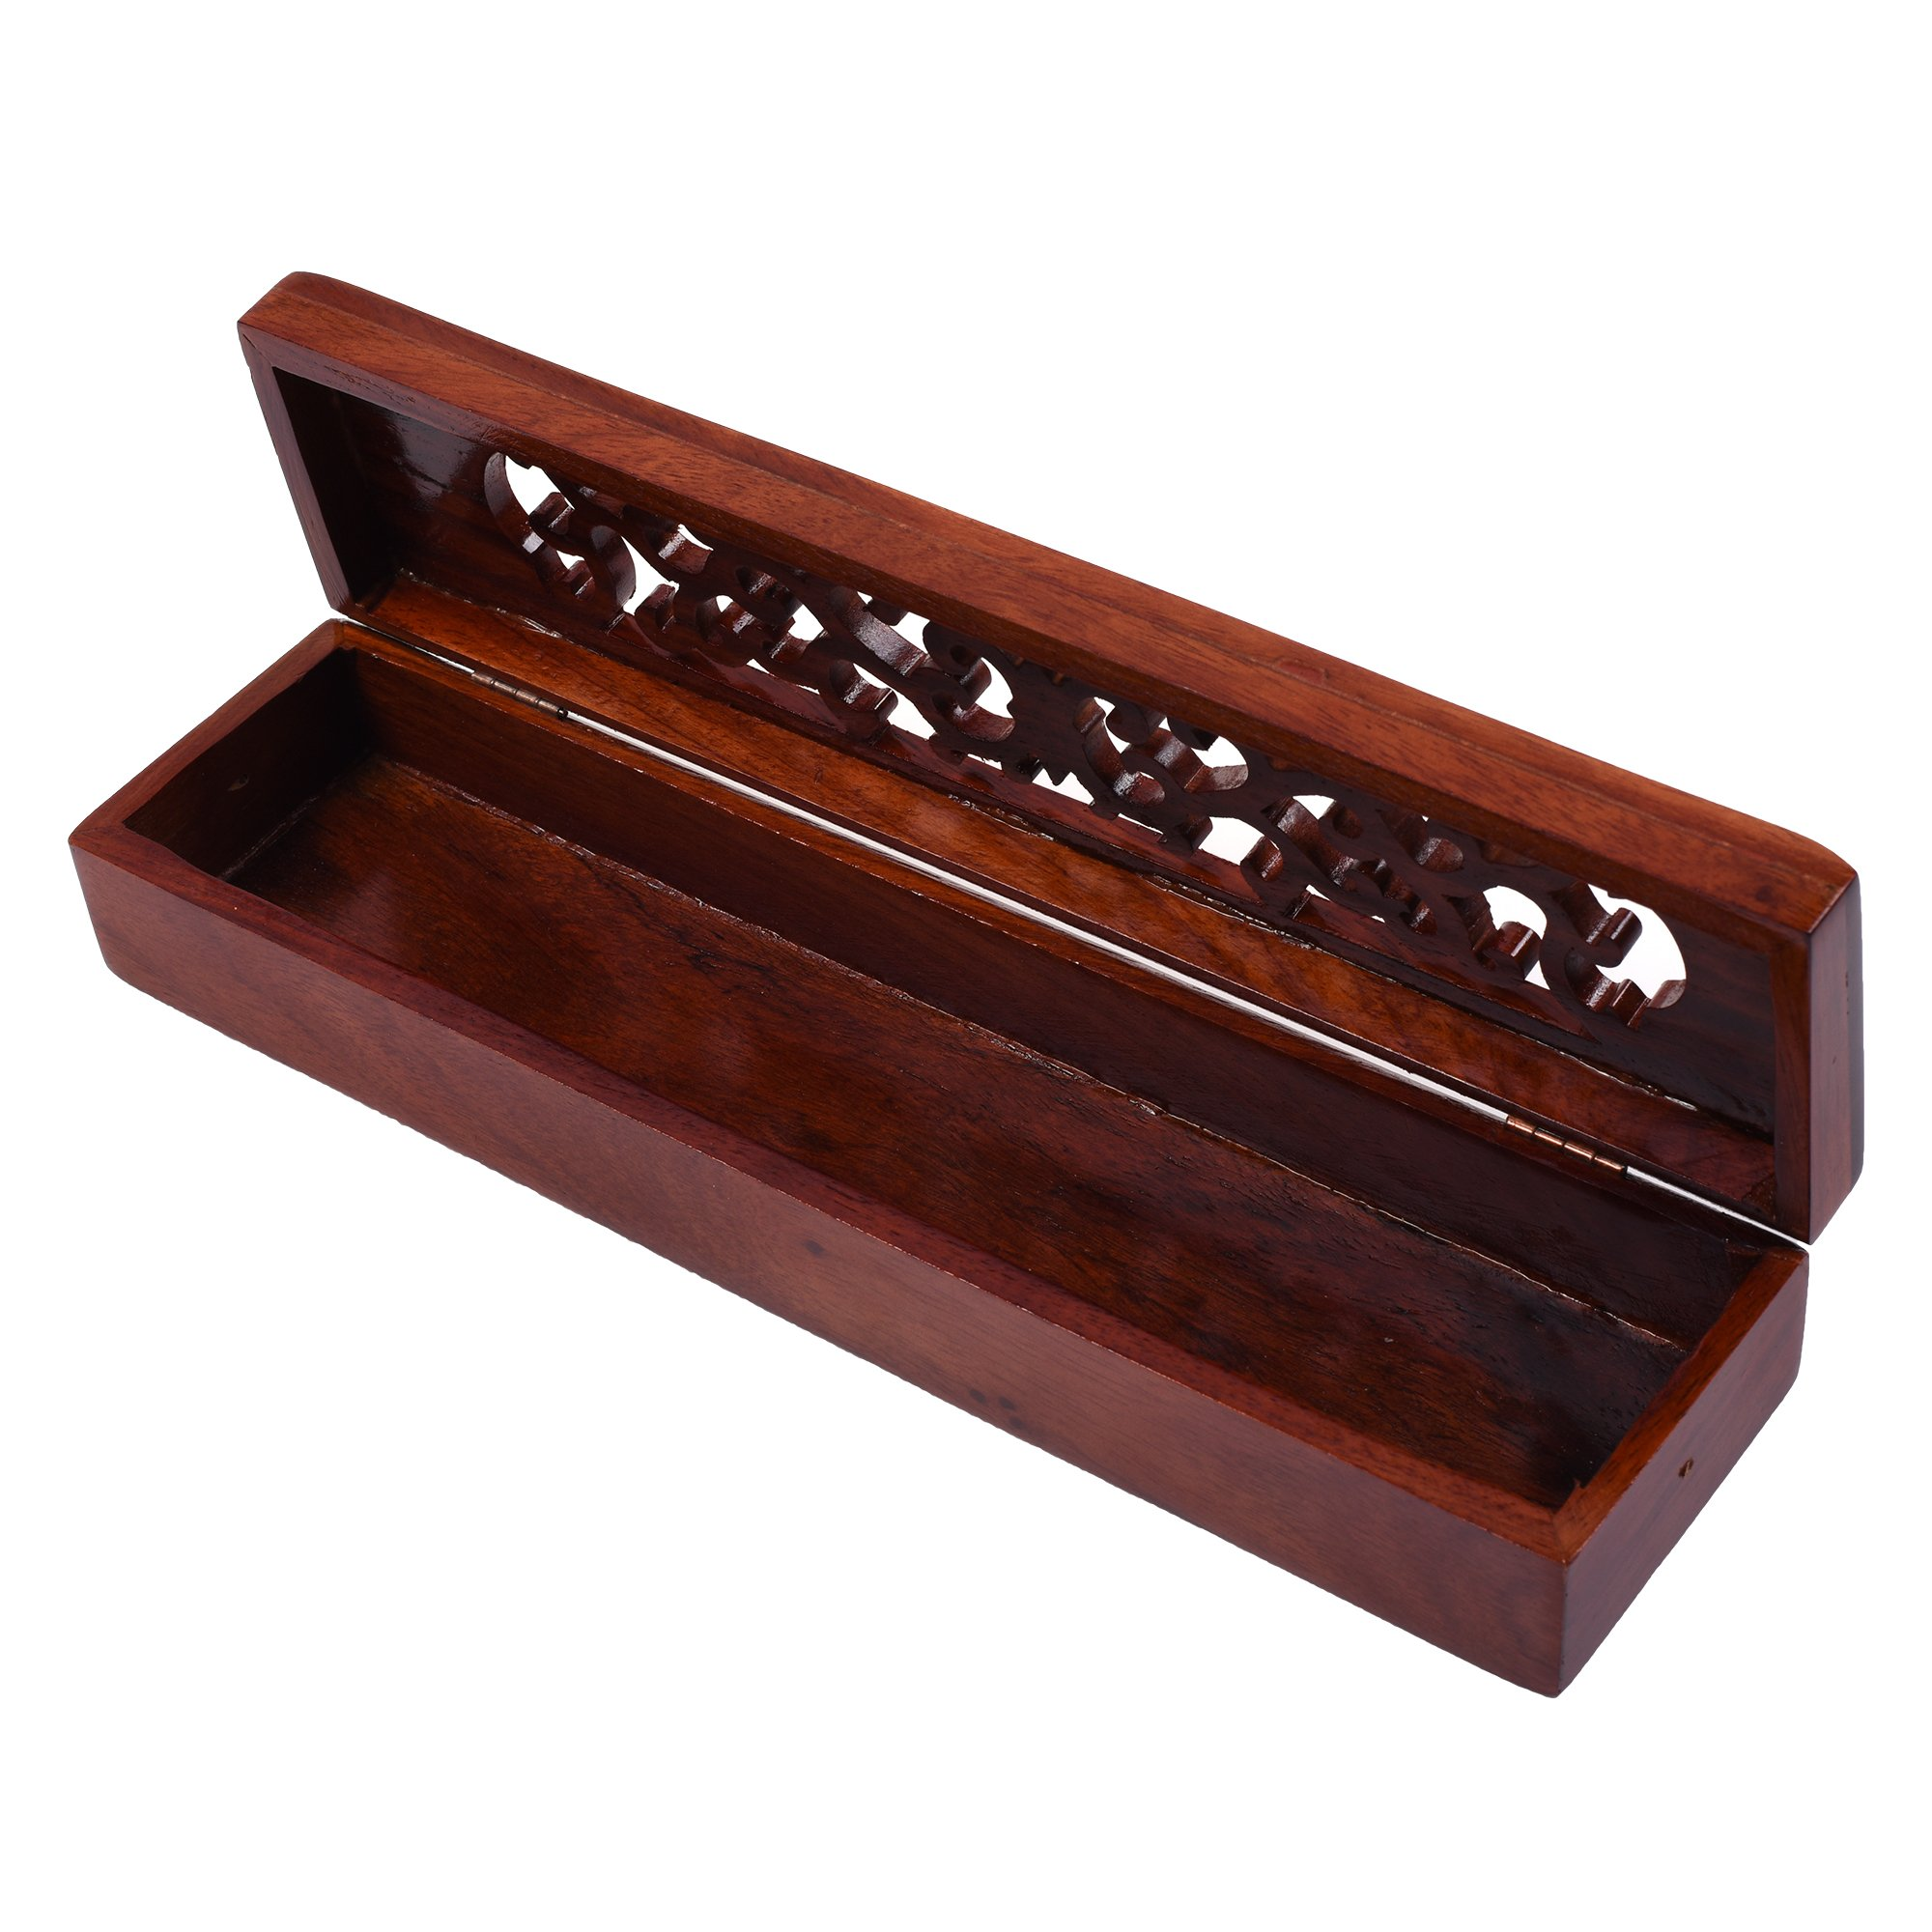 KLOUD City 10.75'' x 2.5'' x 1.75'' Wooden Incense Burner Case Box Holders